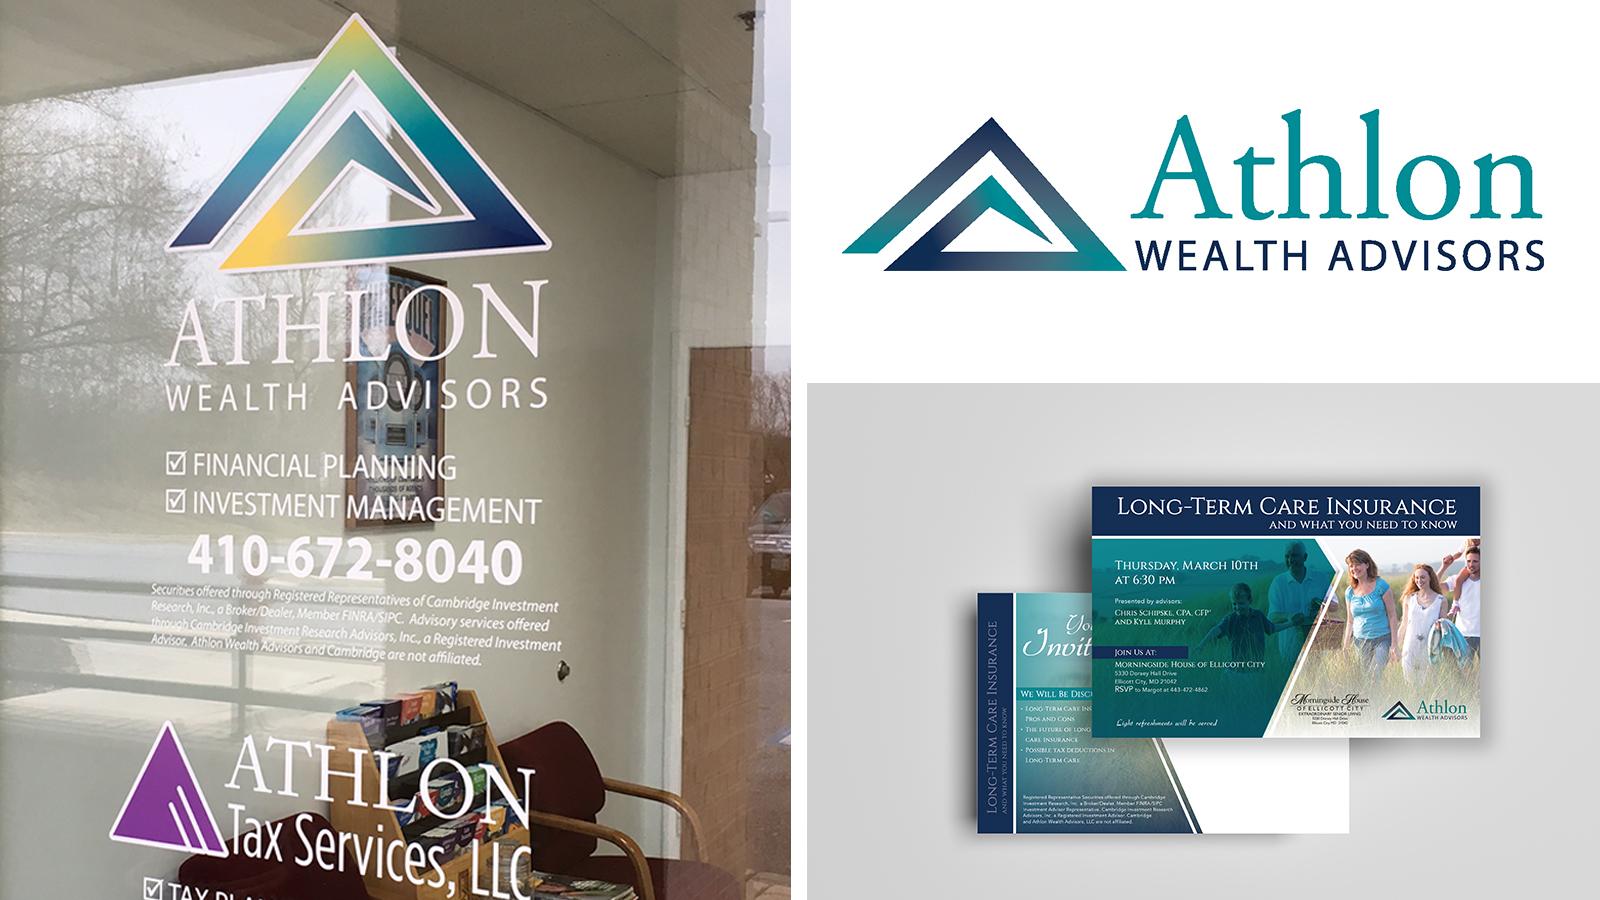 Athlon Wealth Advisors